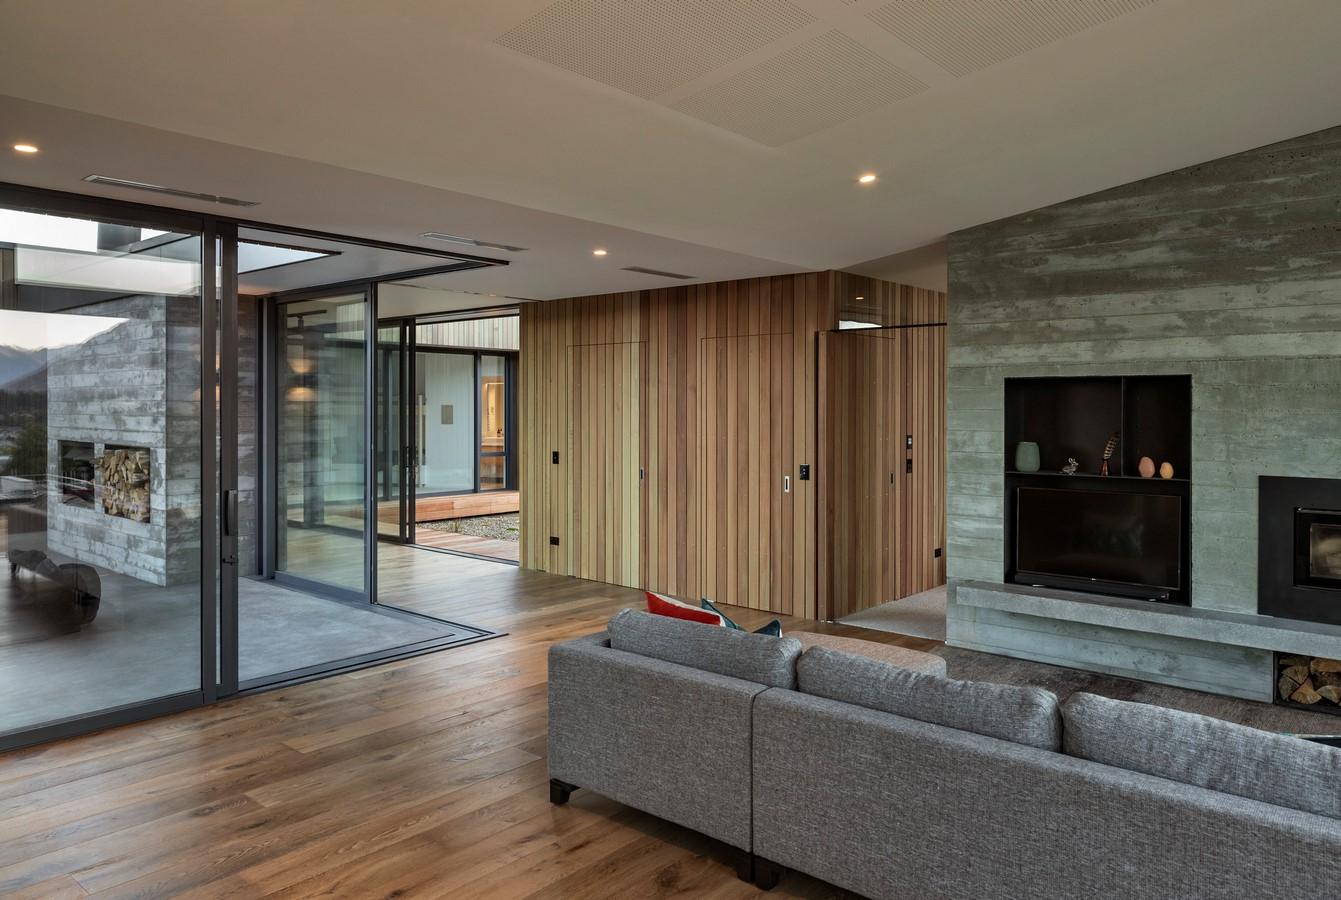 Ruby Ridge House By Condon Scott Architects - Sheet2